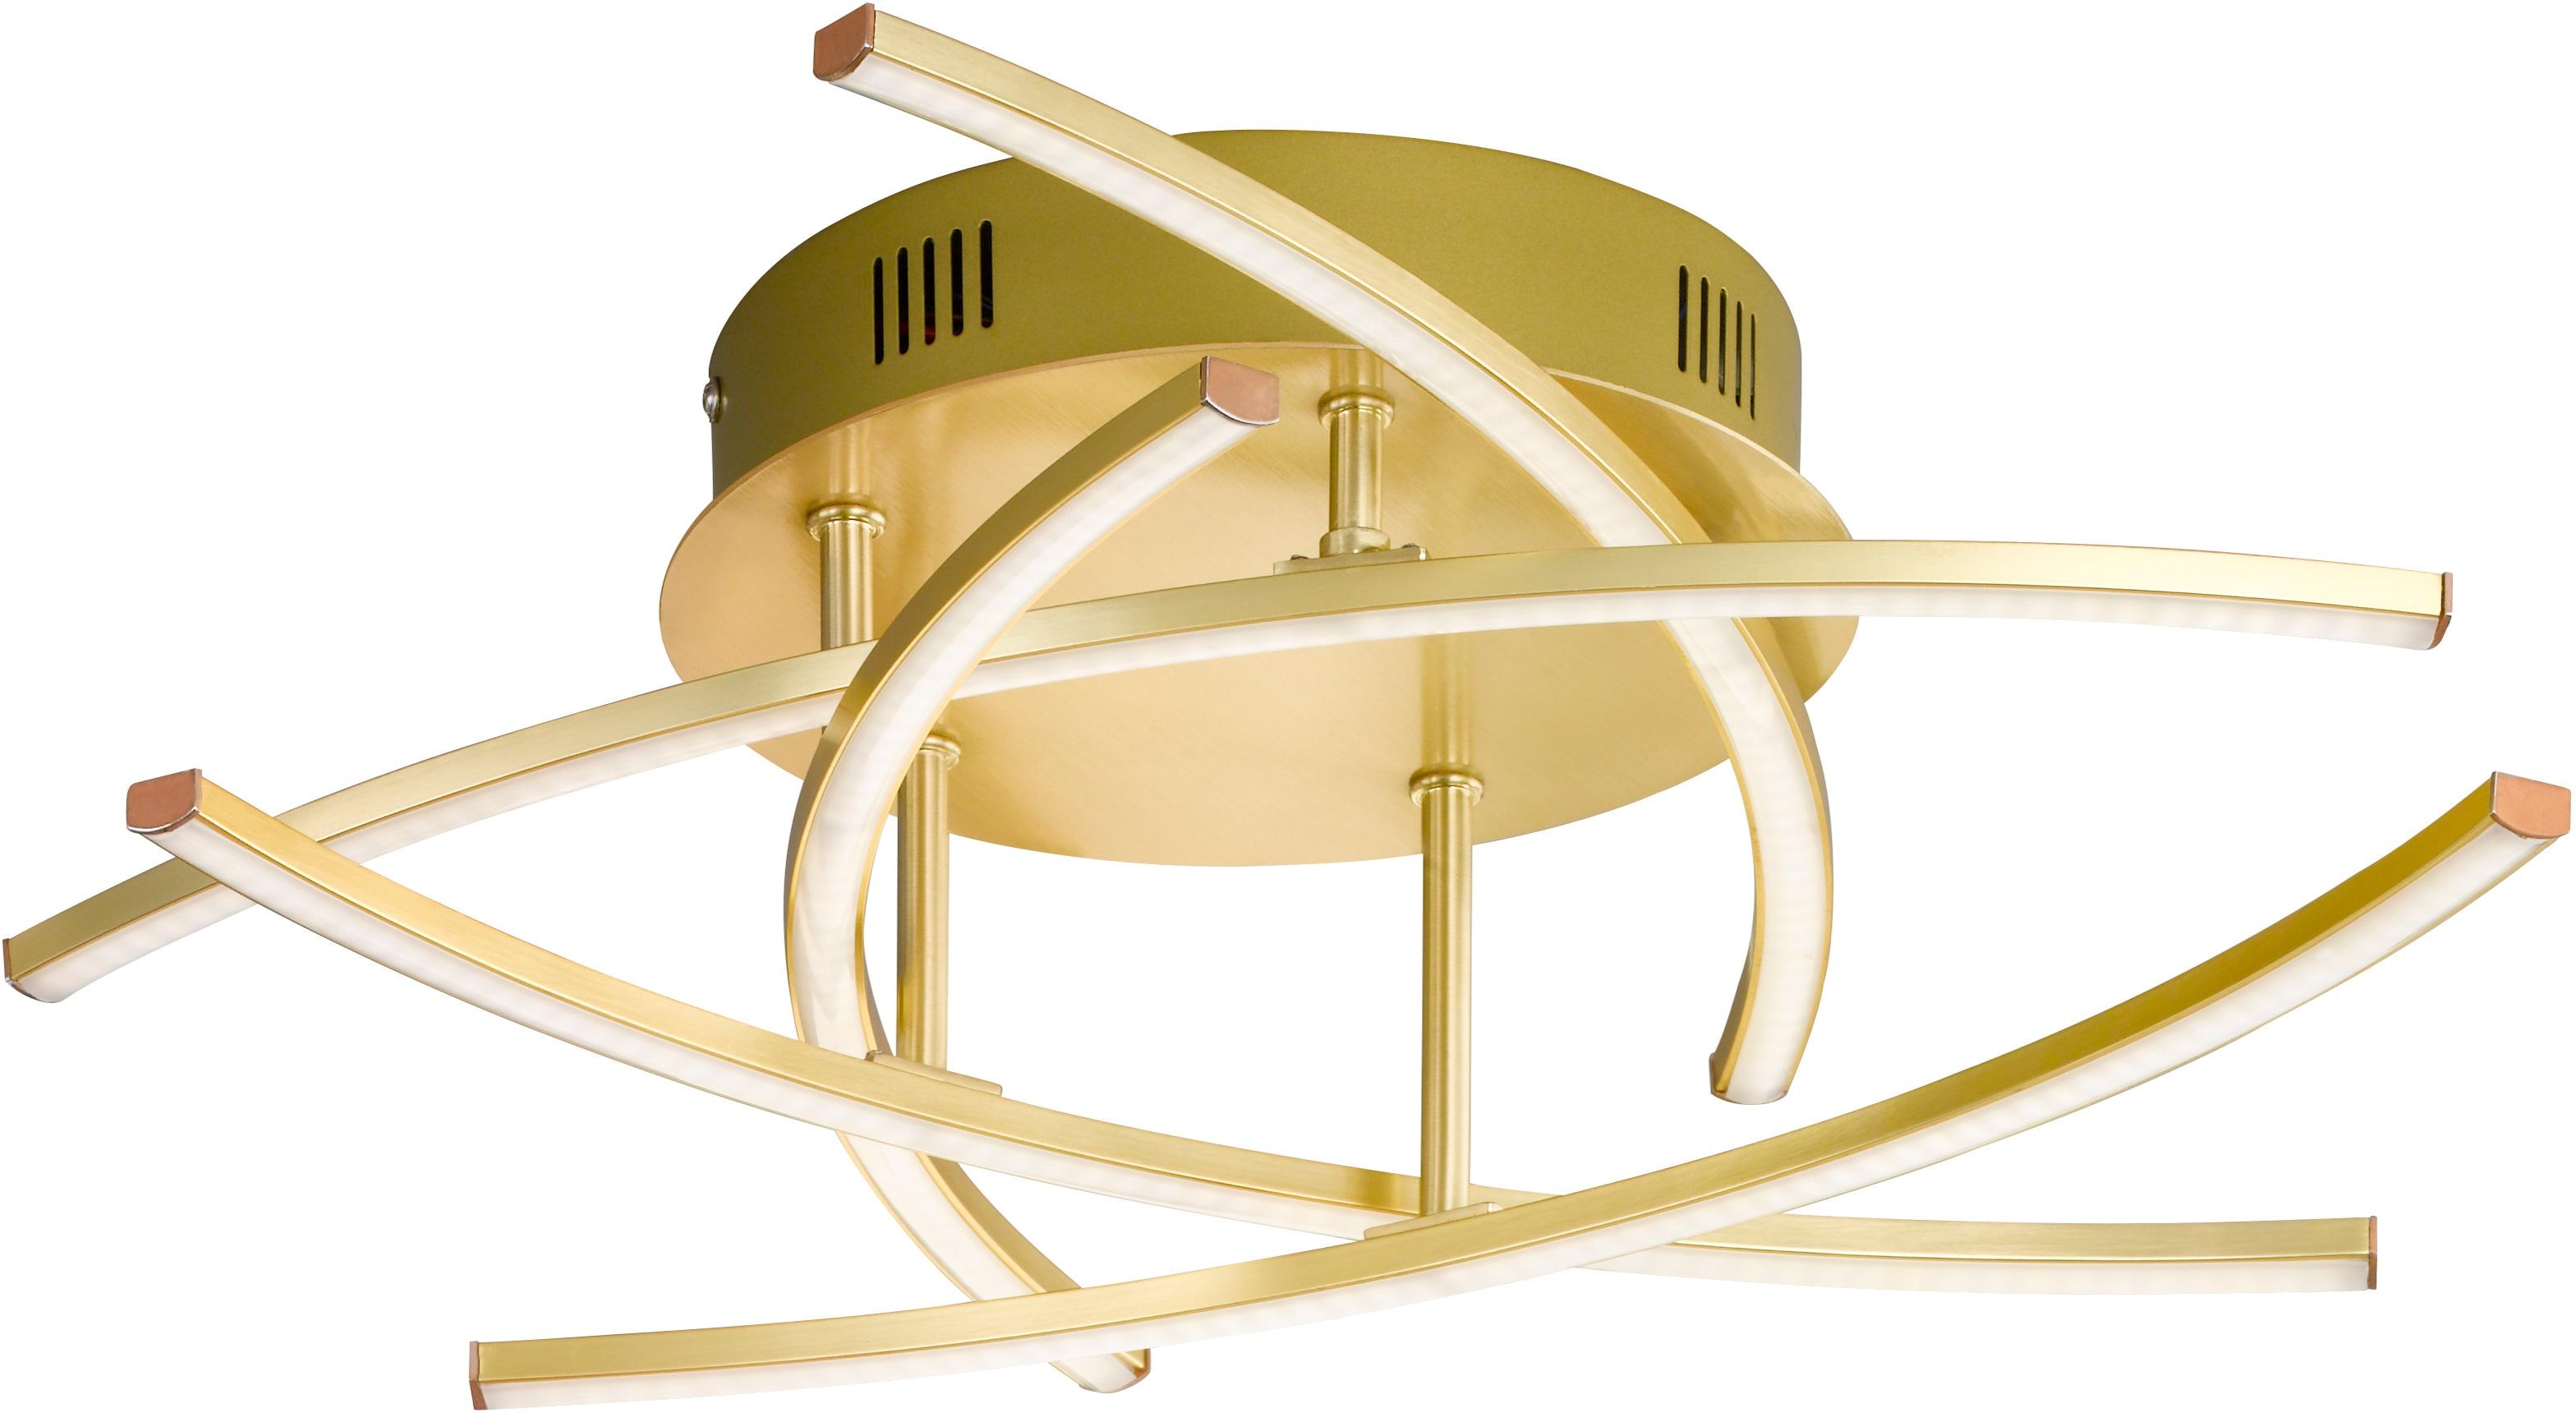 FISCHER & HONSEL LED Deckenleuchte Cross TW, LED-Modul, Warmweiß-Neutralweiß